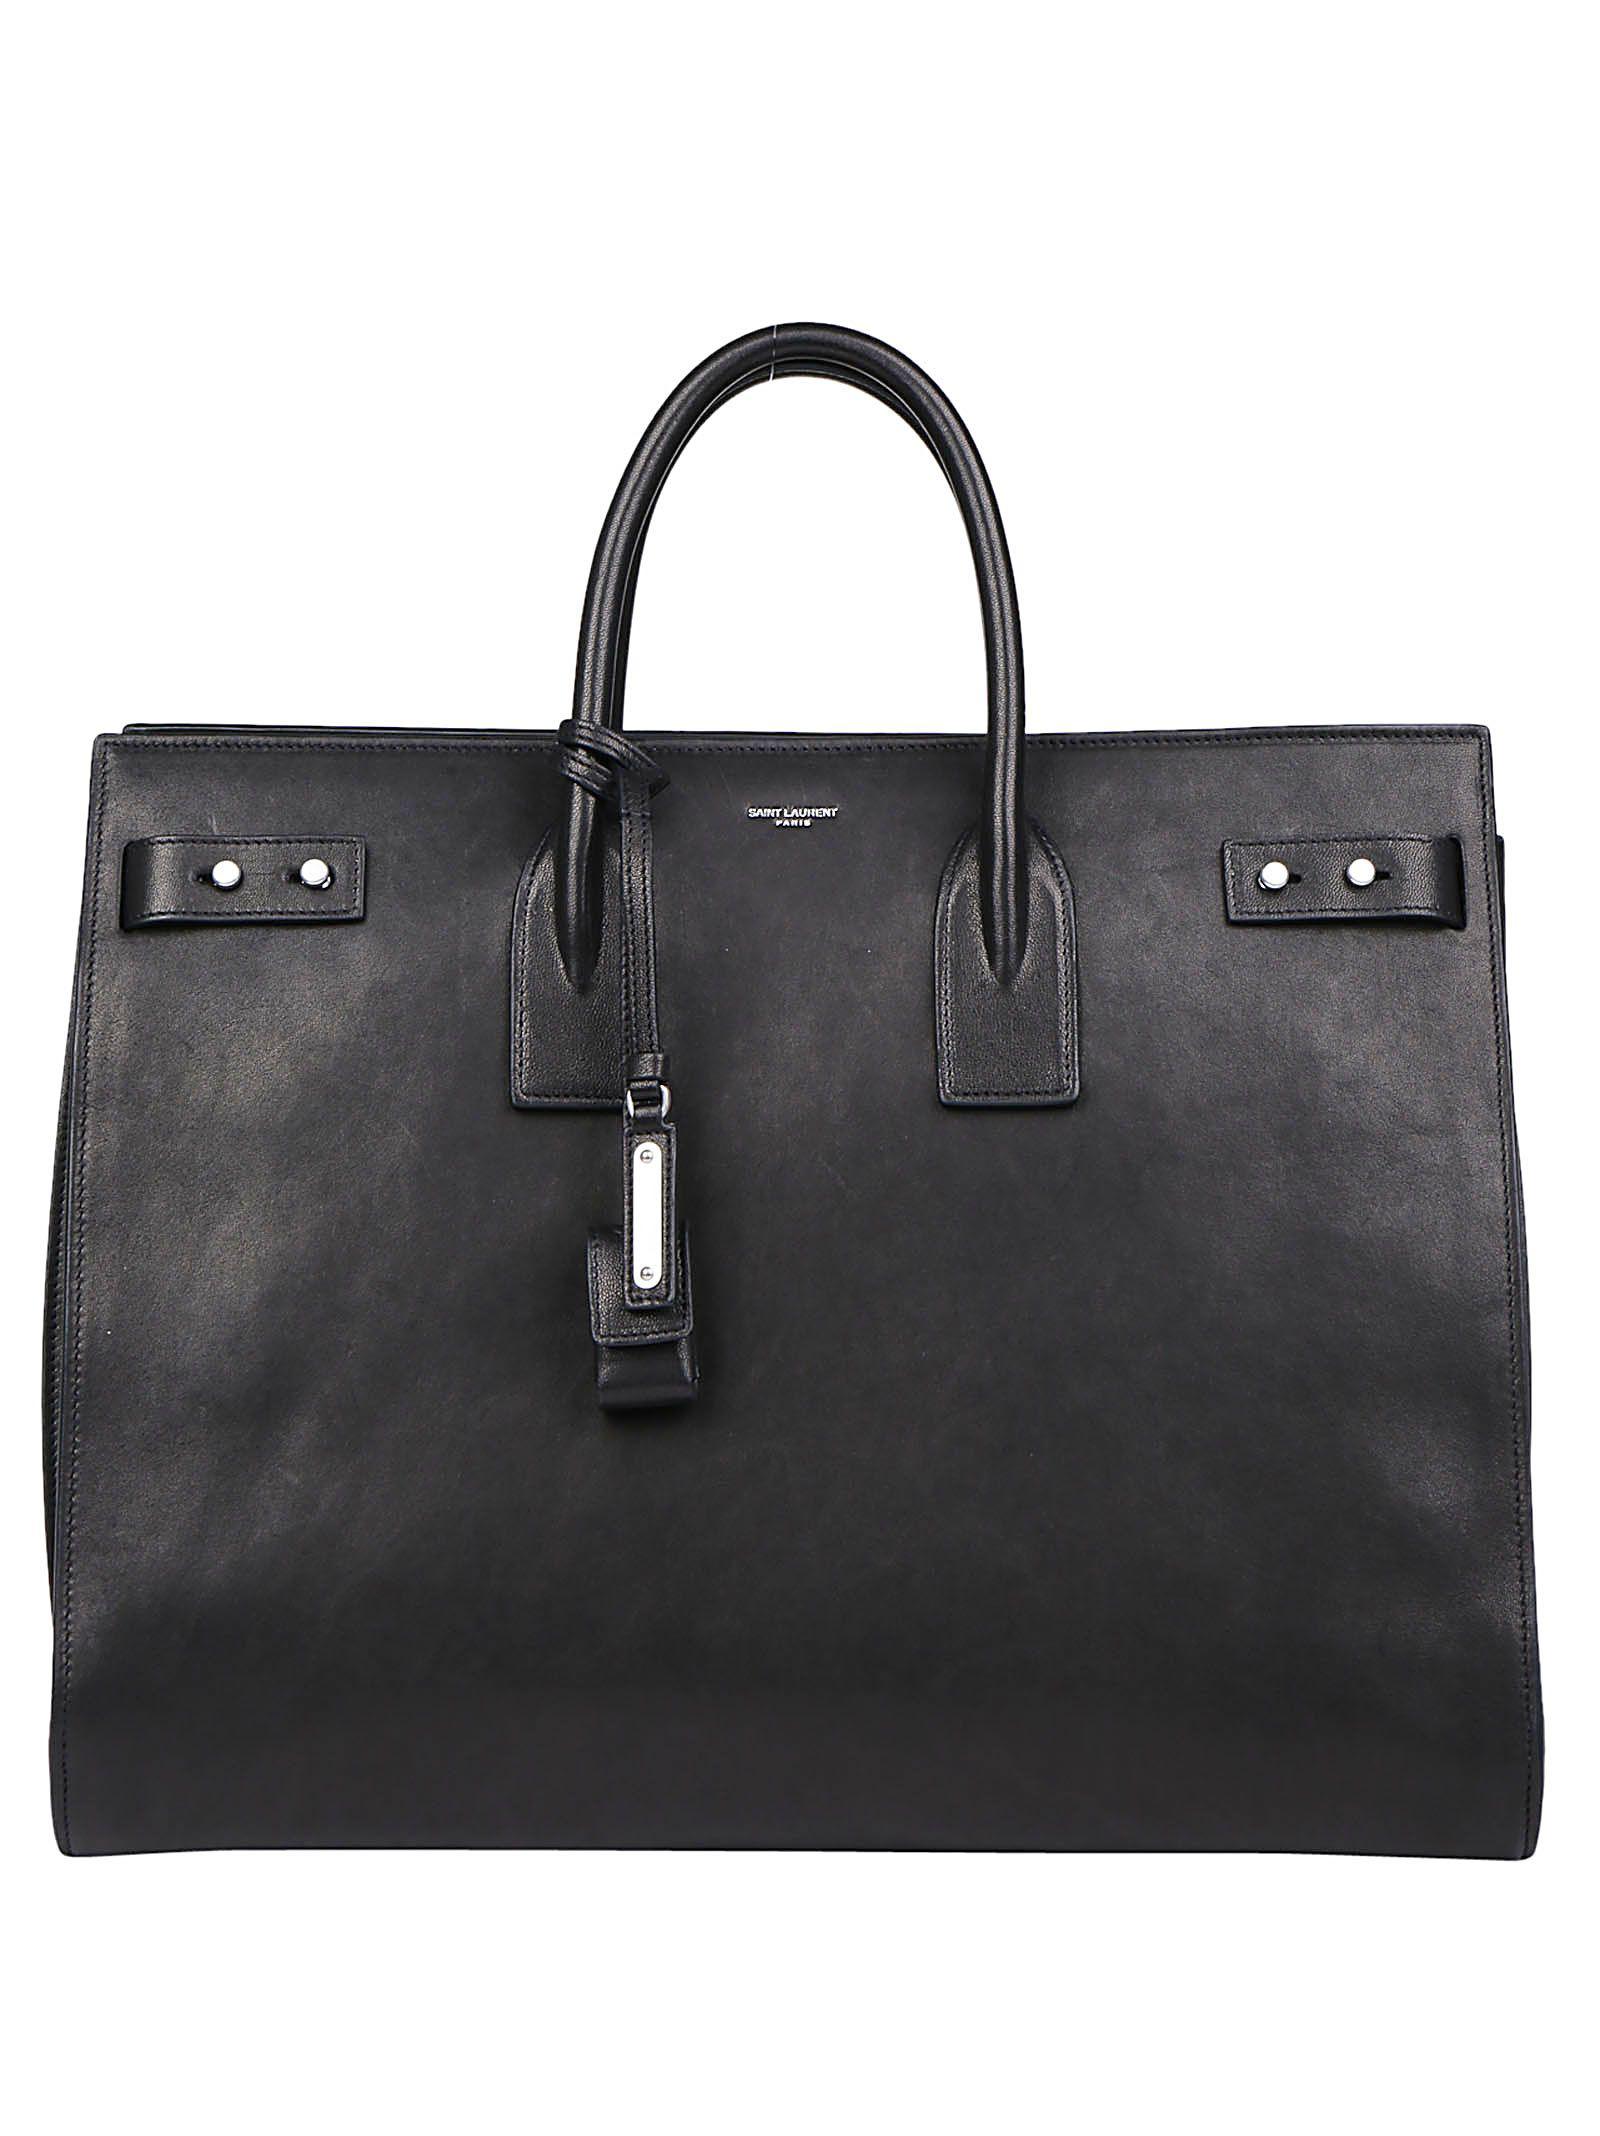 e707e4ac0ed7 Saint Laurent Sac De Jour Large Full-Grain Leather Tote Bag In Black ...